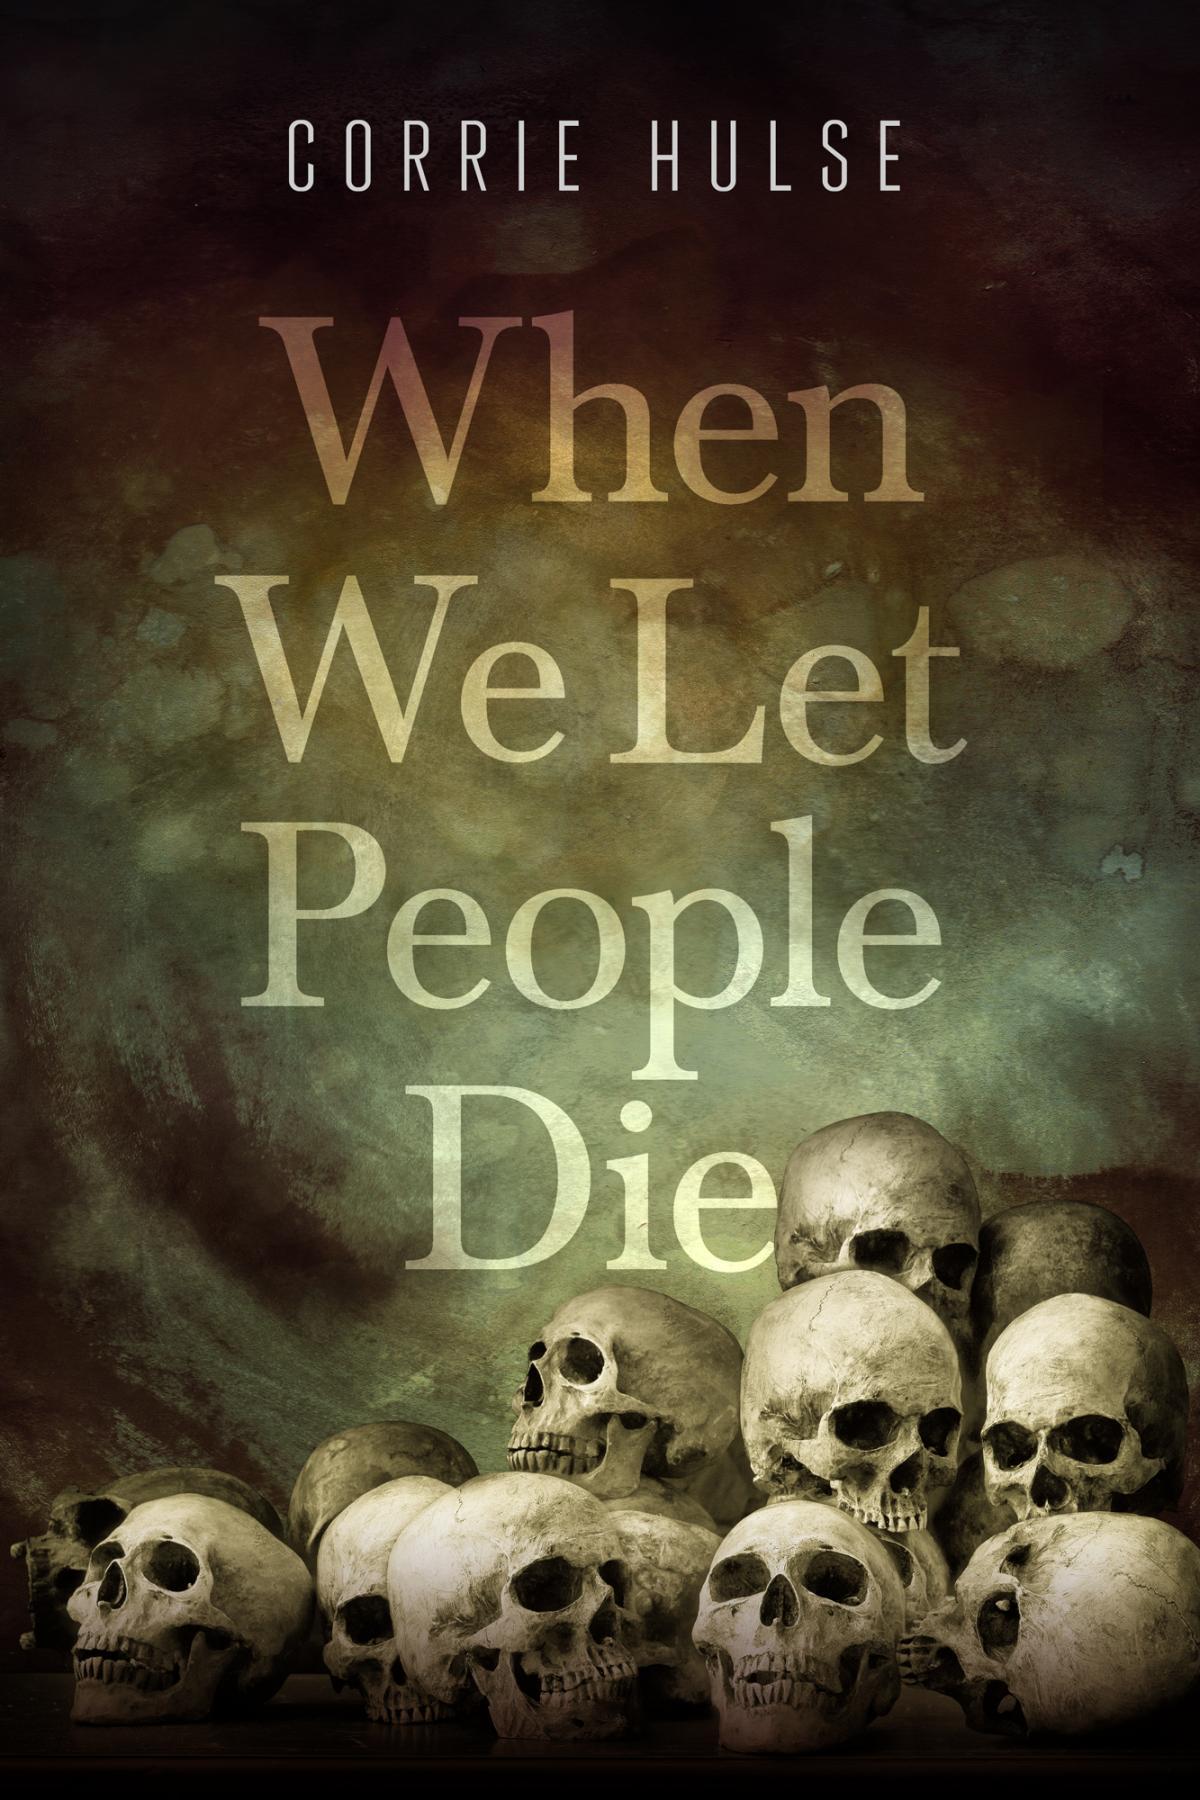 2000x1333 Book Cover